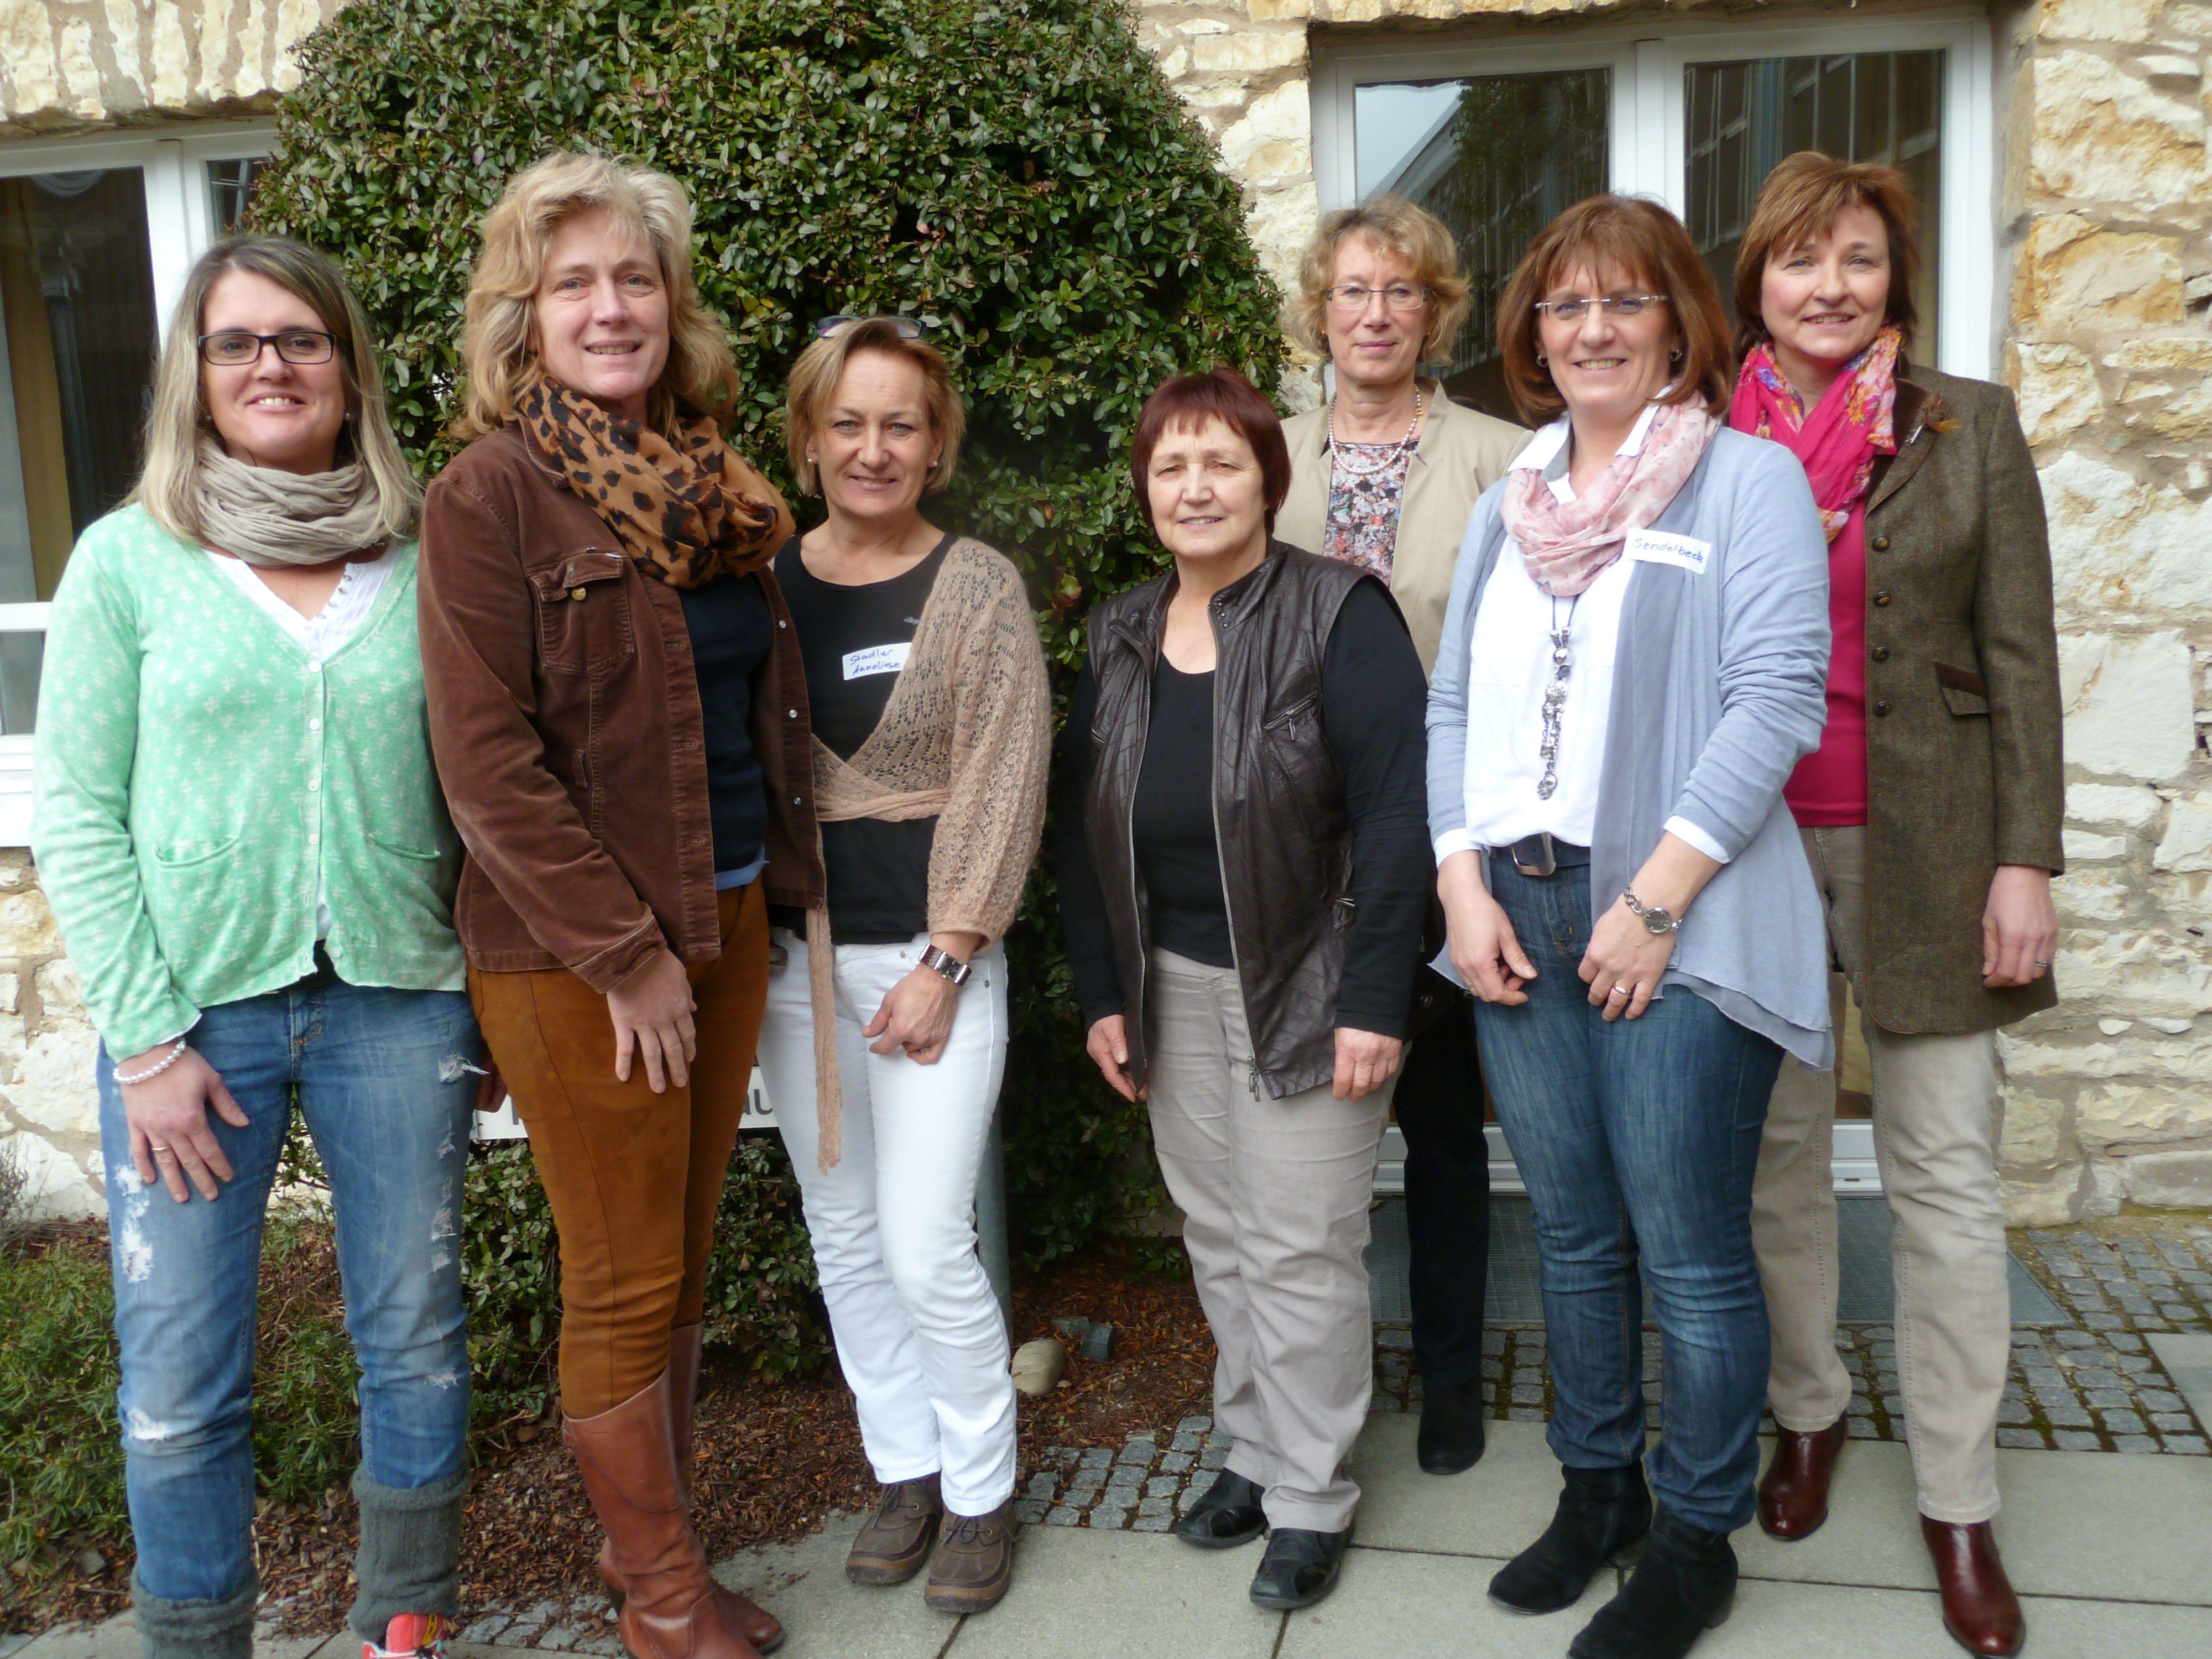 Melanie Hofmann, Monika Bauer, Anneliese Stadler, Else Oppelt, Elisabeth Loock, Elke Sendelbeck, Anita Sack.